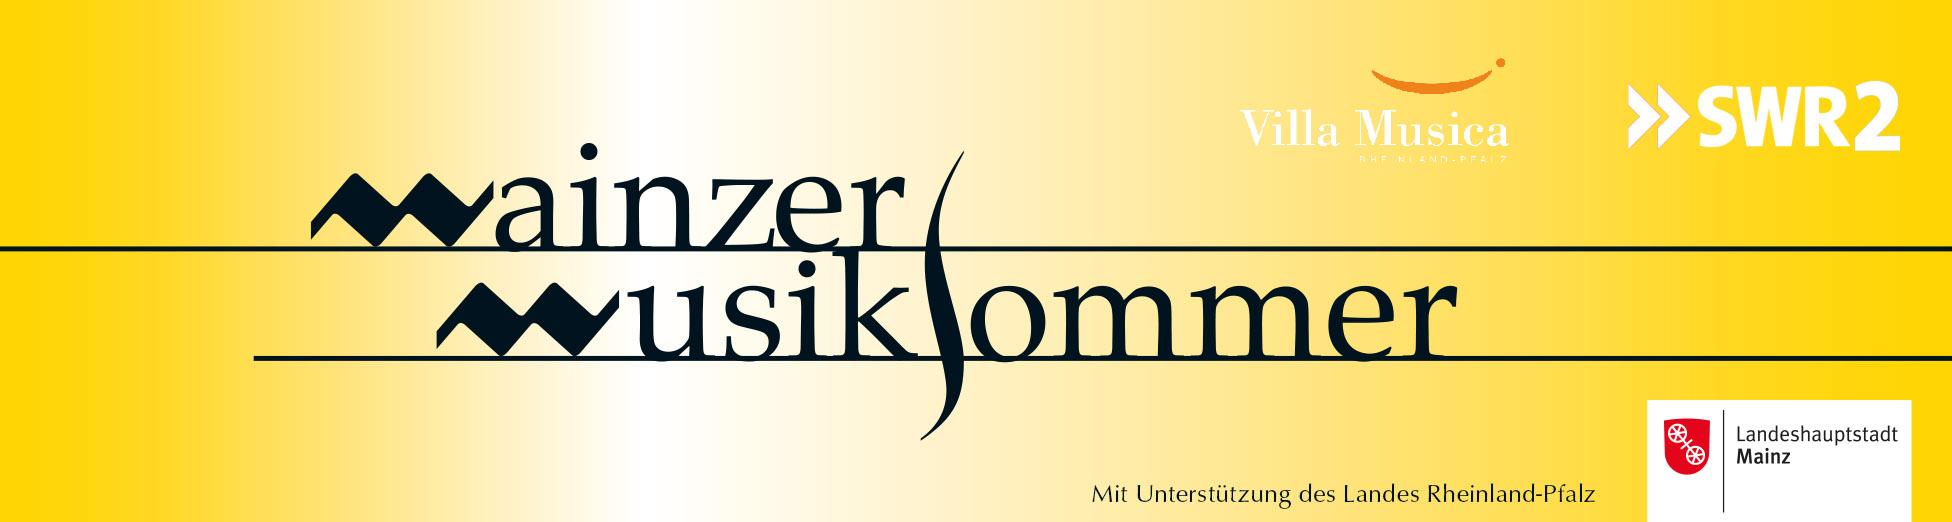 Mainzer Musiksommer Banner Website.jpg